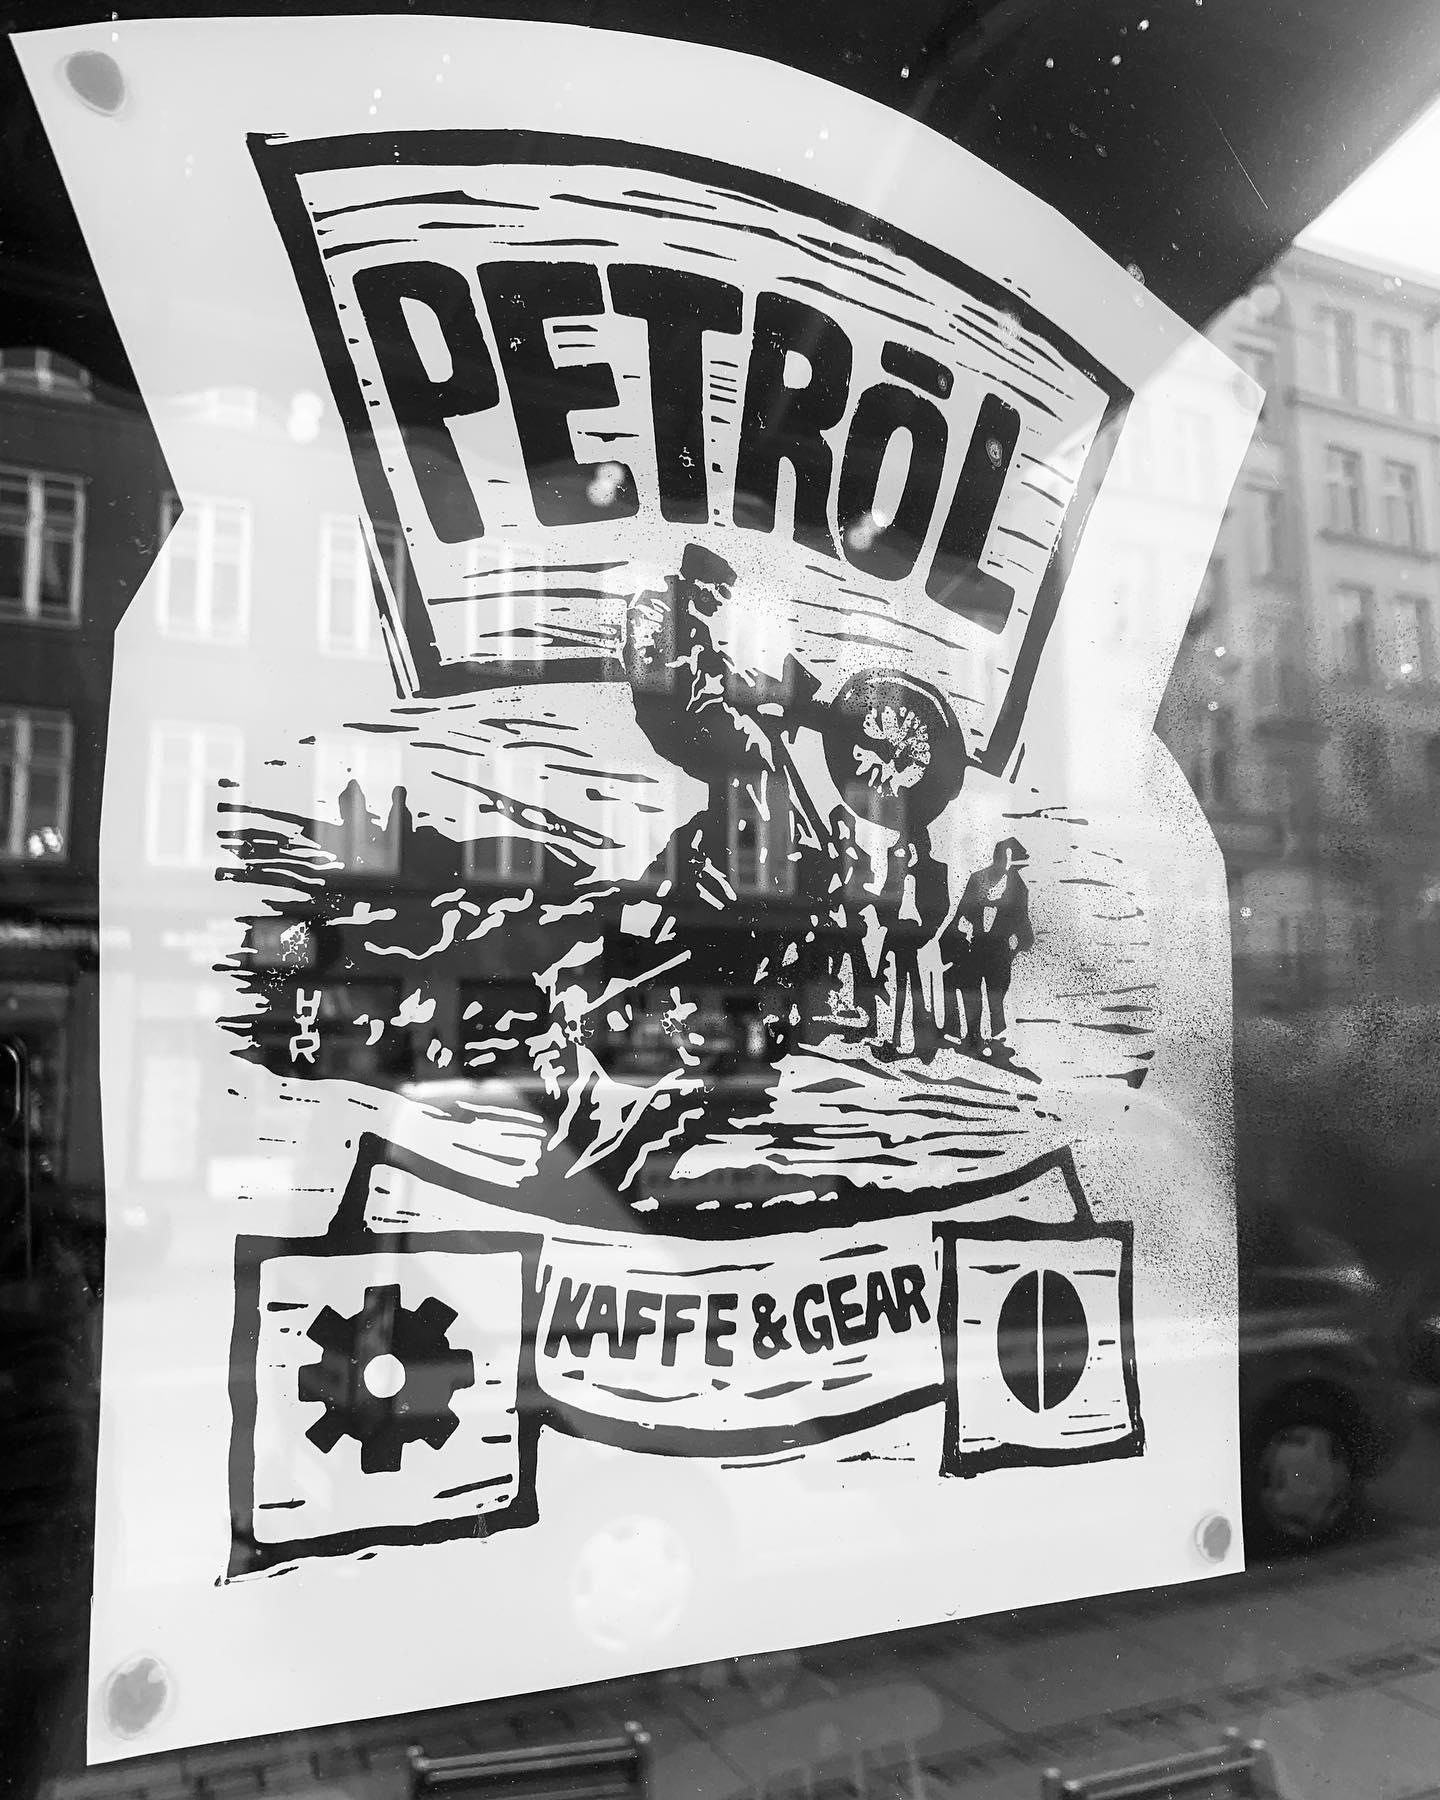 Kaffebar Petrol